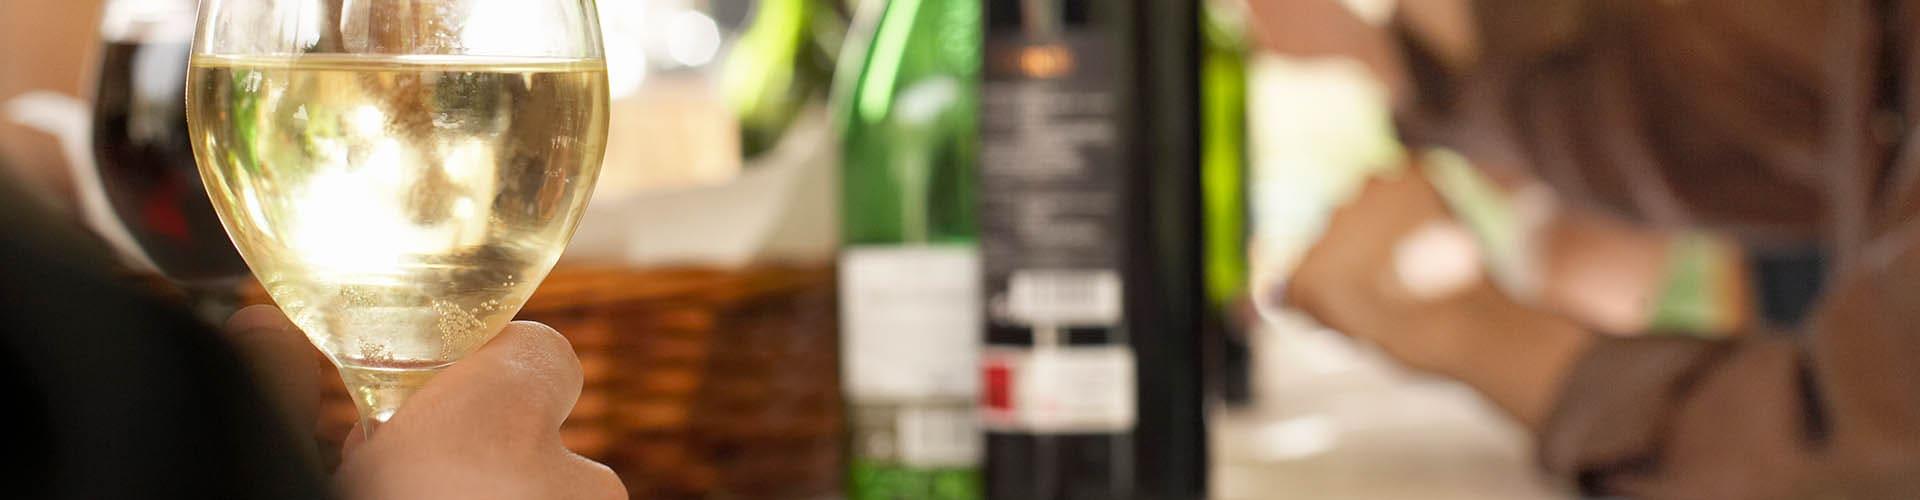 wine club management system, Wine Club Management System